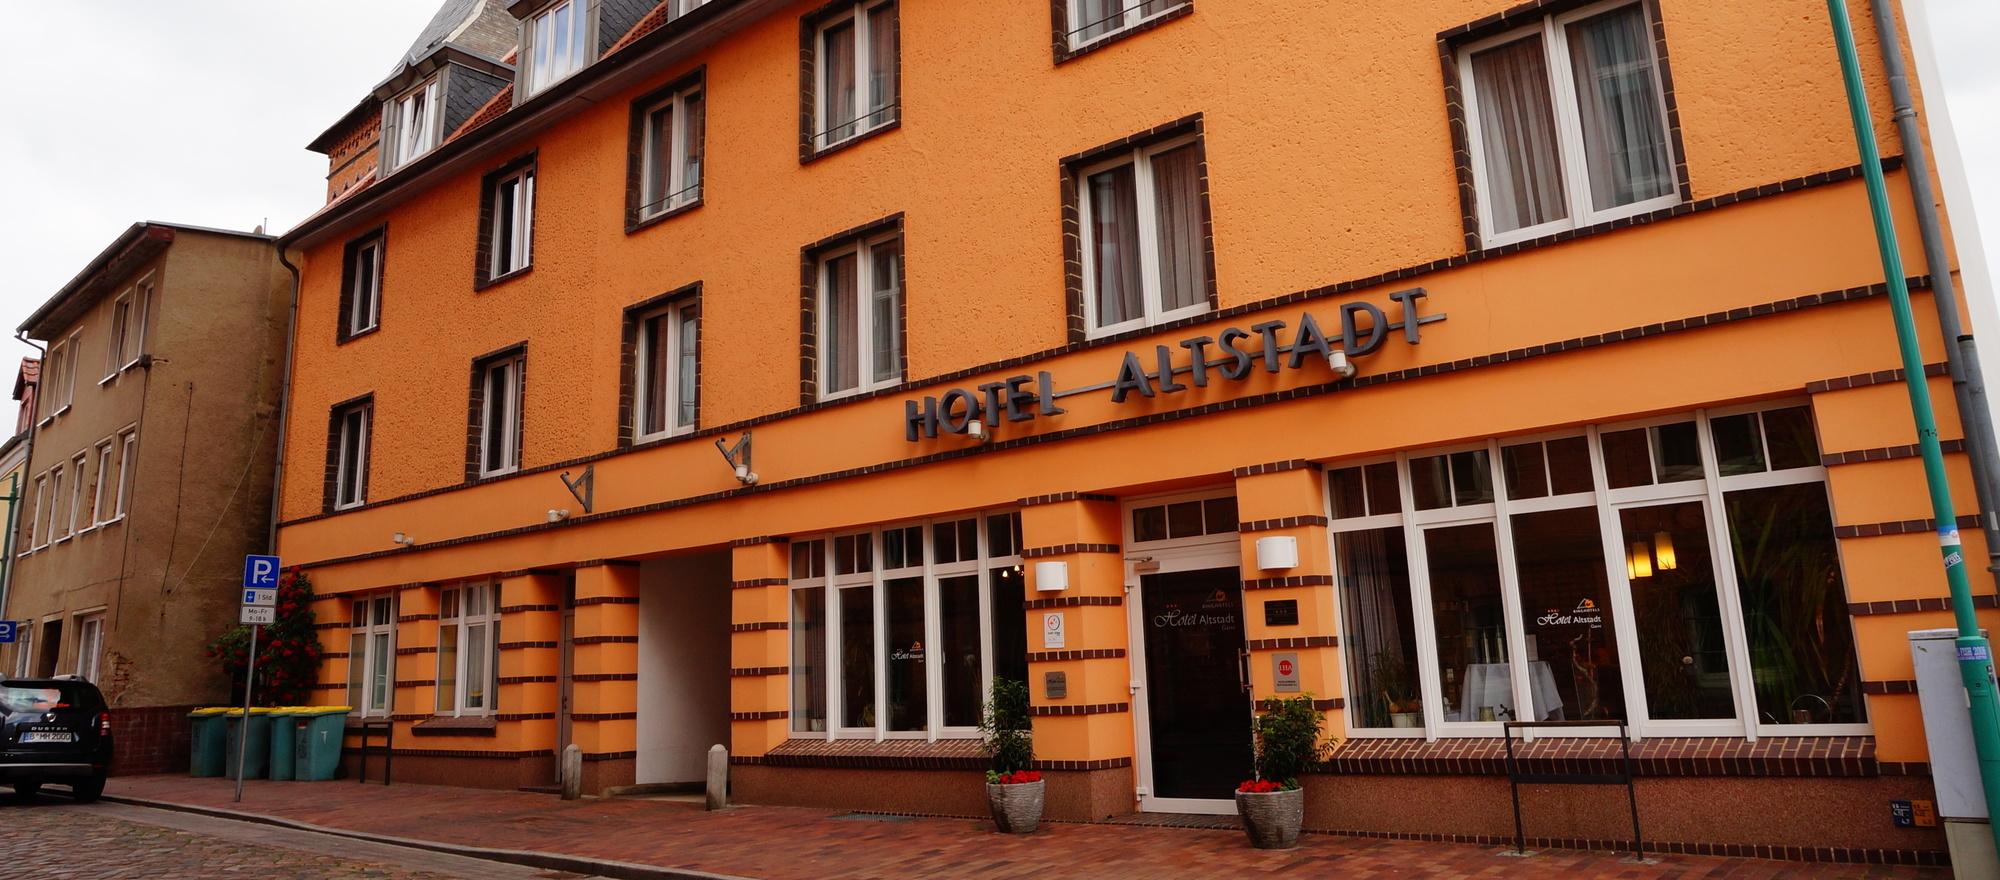 Ringhotel Altstadt Garni In Gustrow Mecklenburg Vorpommern Ringhotels